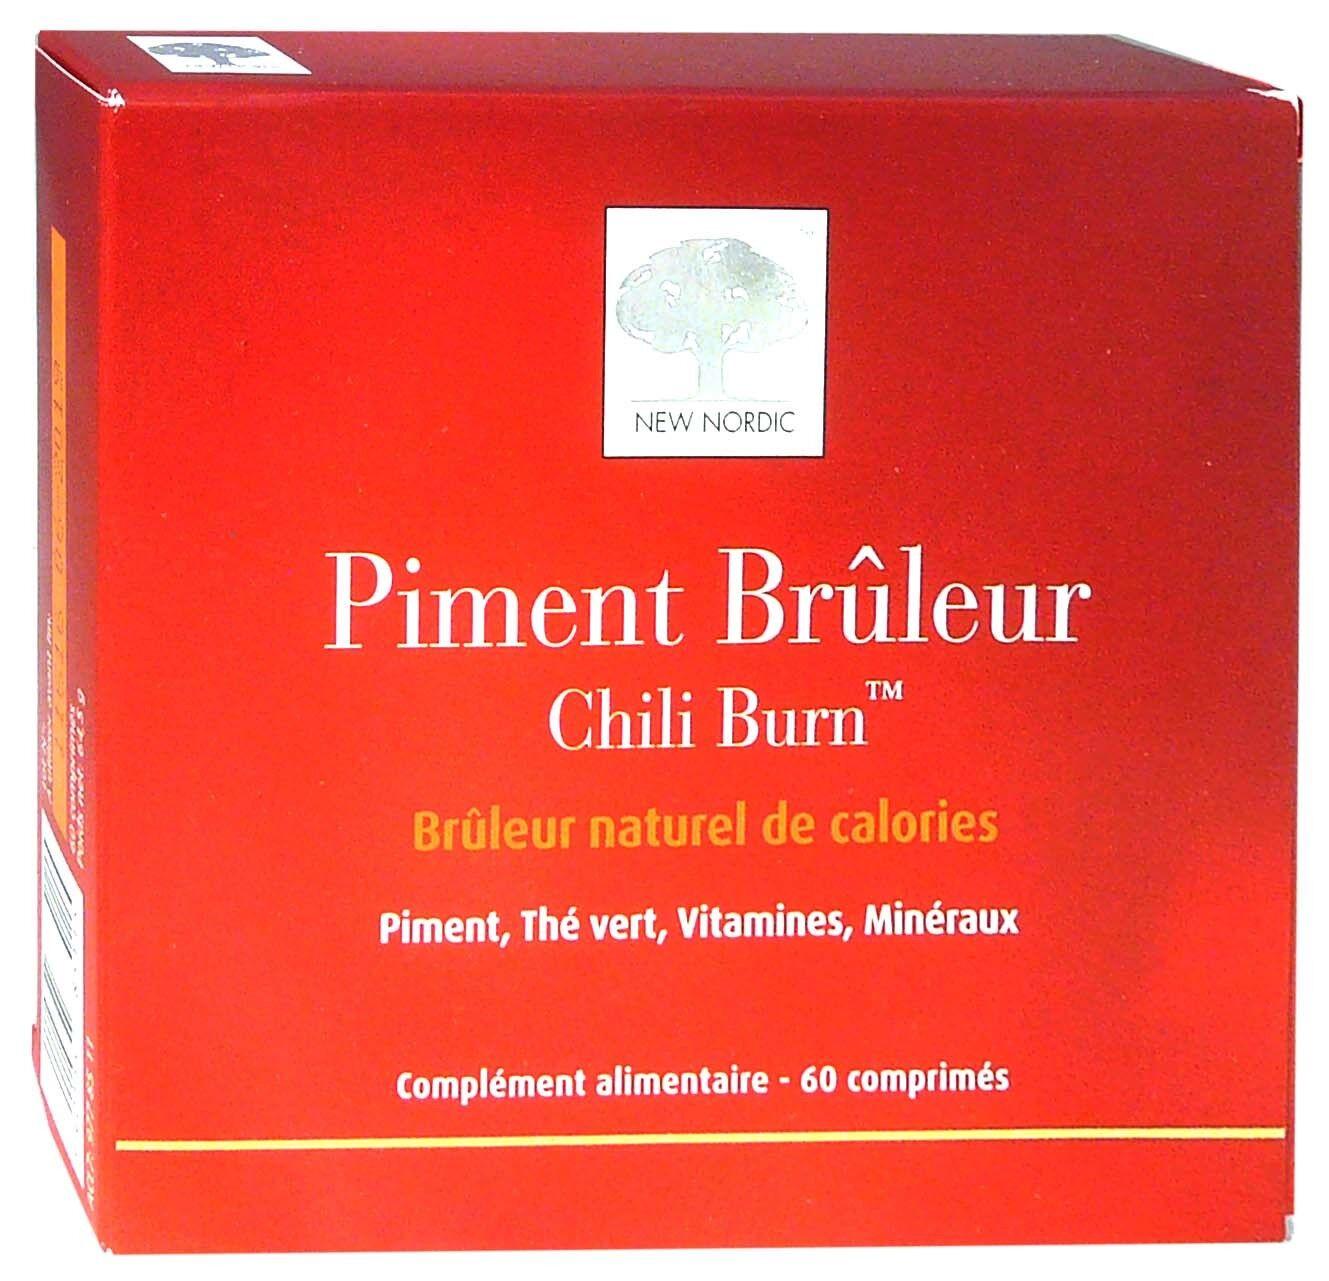 NEW NORDIC Piment bruleur naturel de calories 60 comprimes